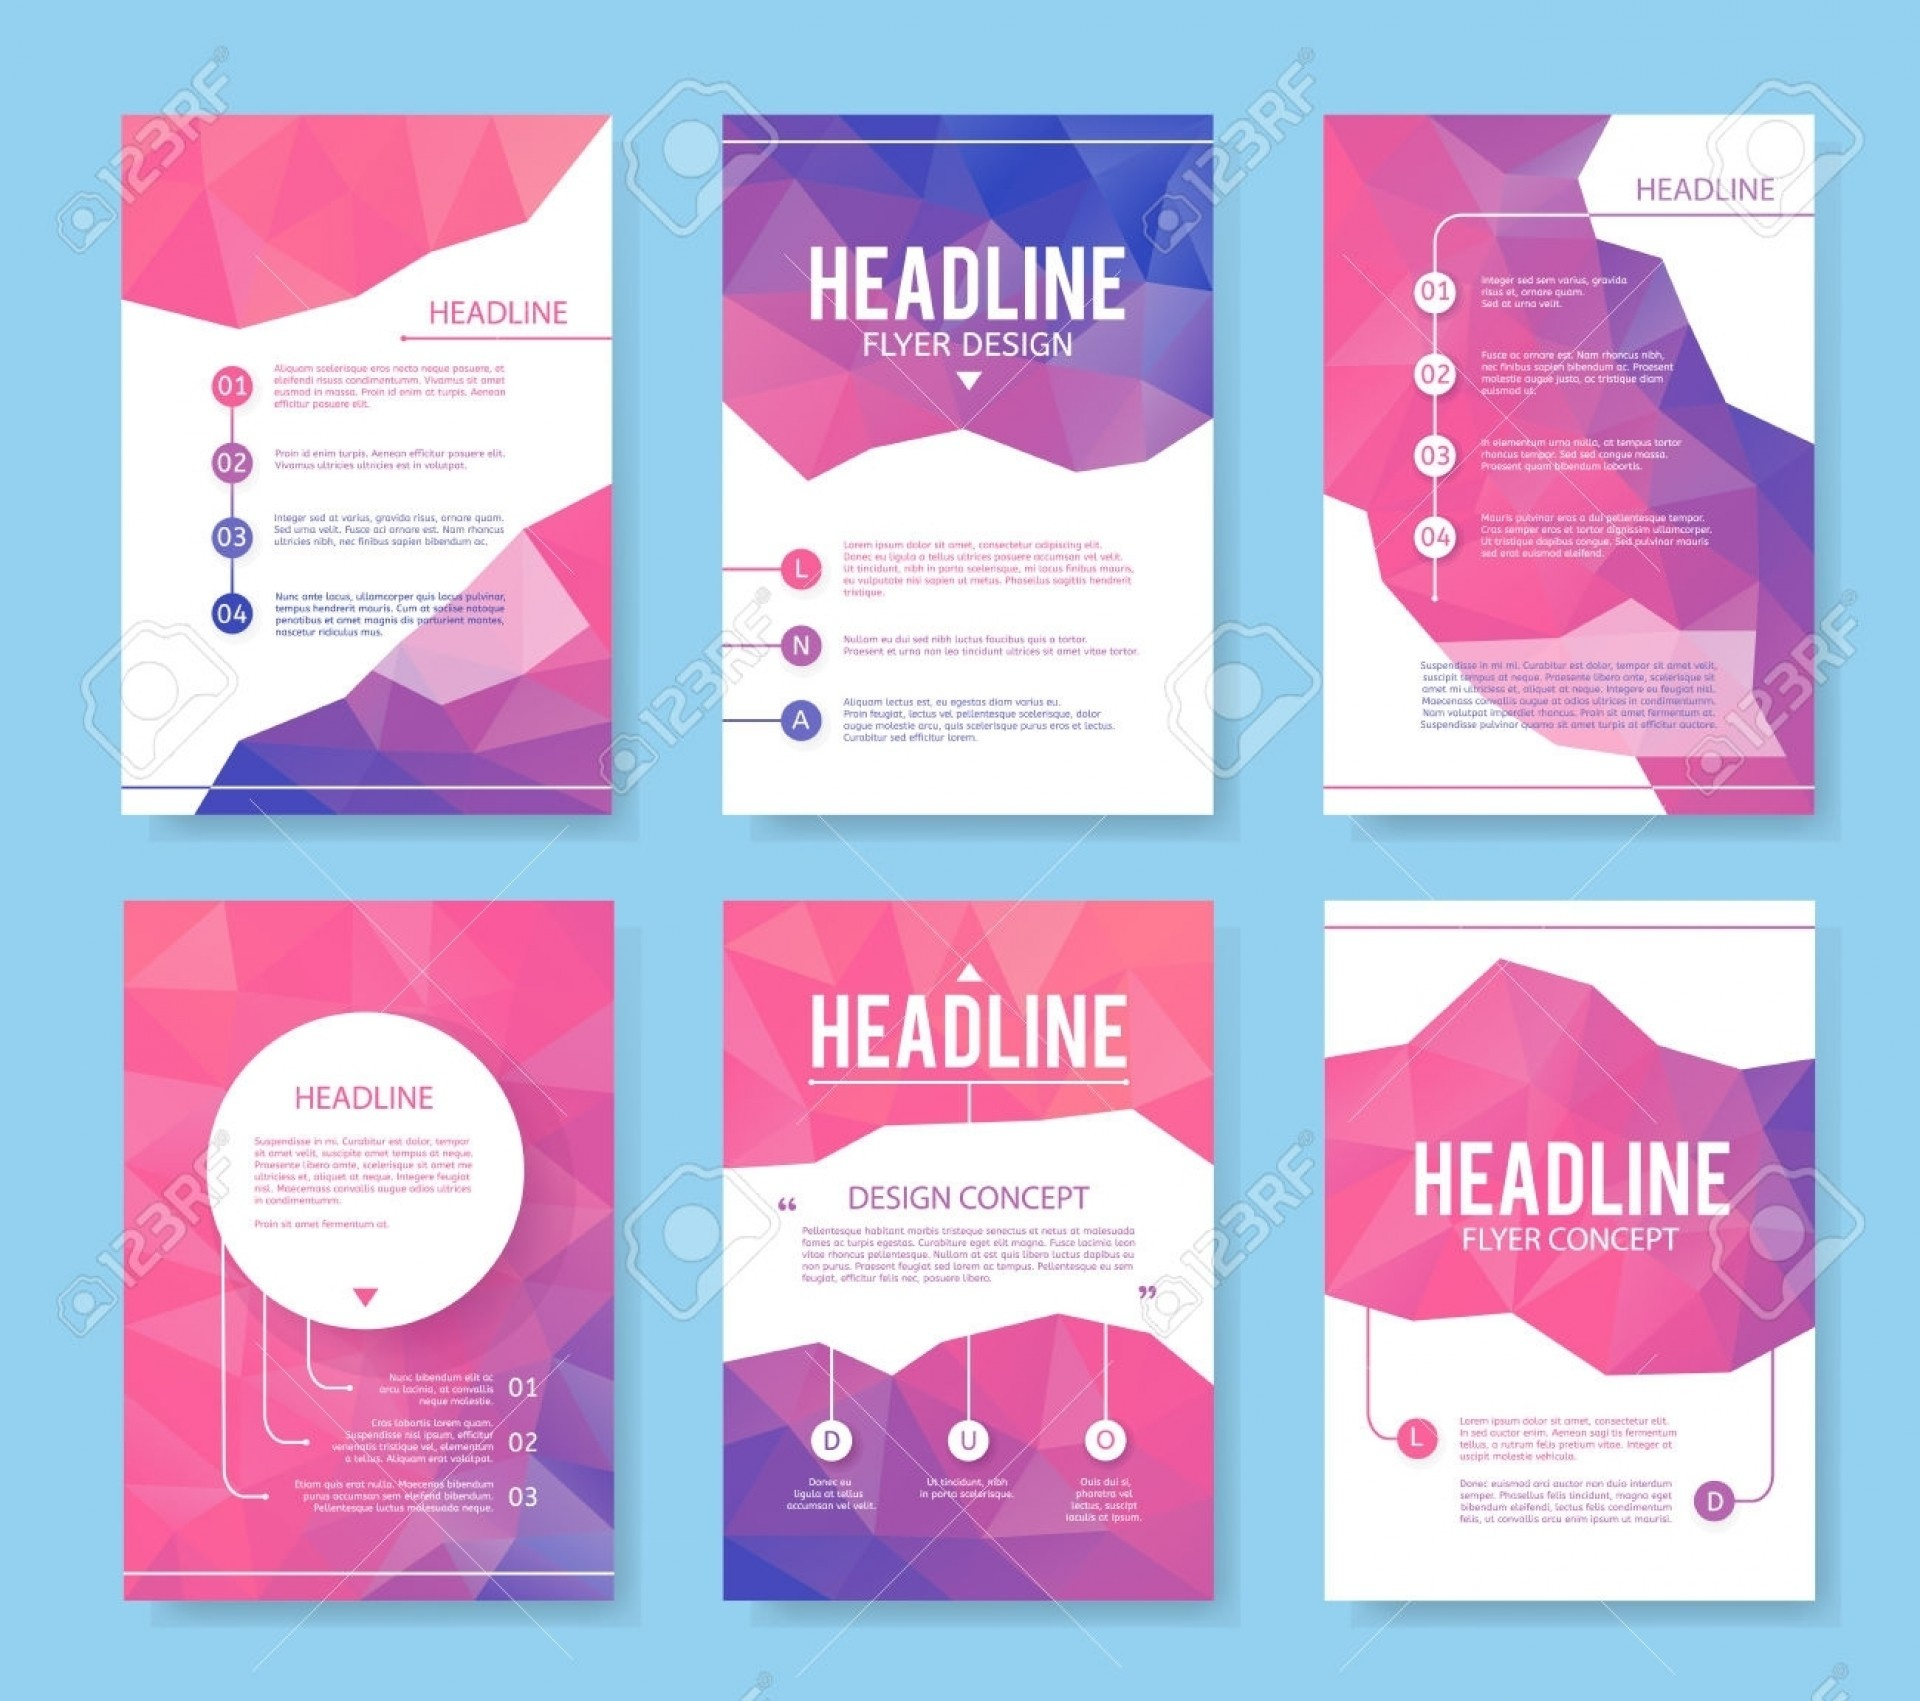 004 Template Ideas Free Printable Flyer Templates Blank Brochure - Free Printable Flyers